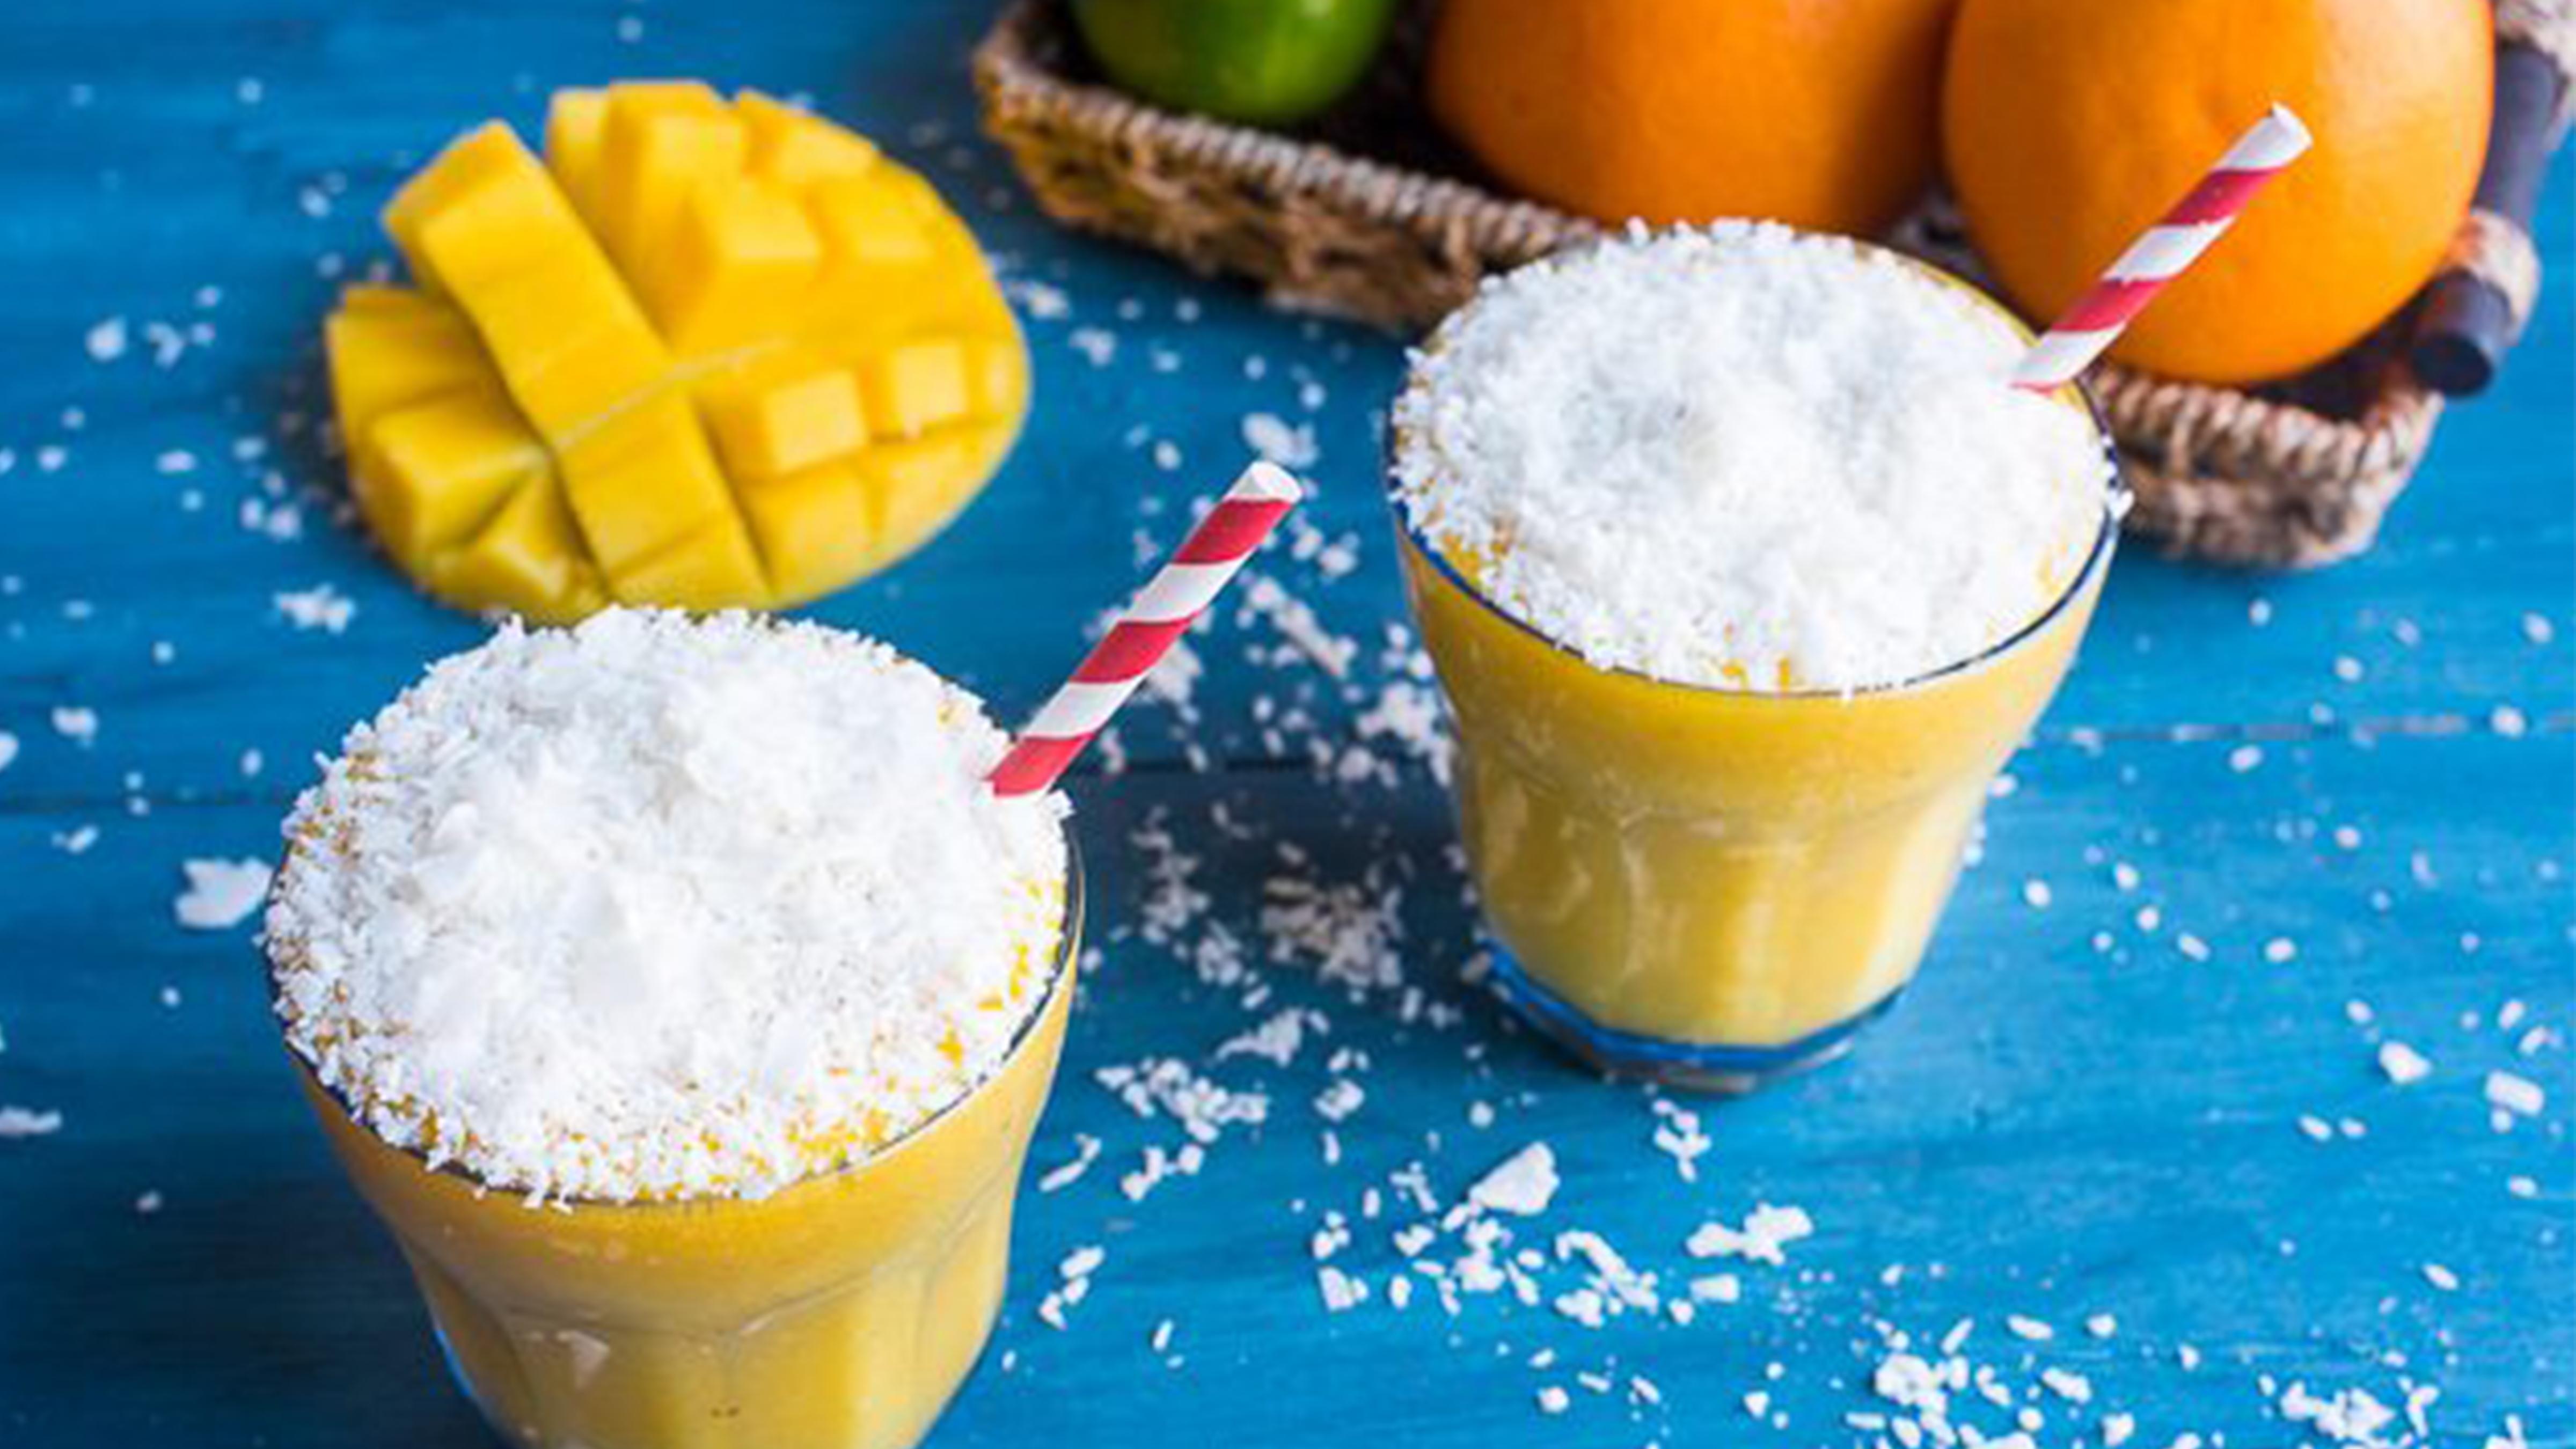 10 Immunity-Boosting Smoothies That Taste Like Not Getting Sick